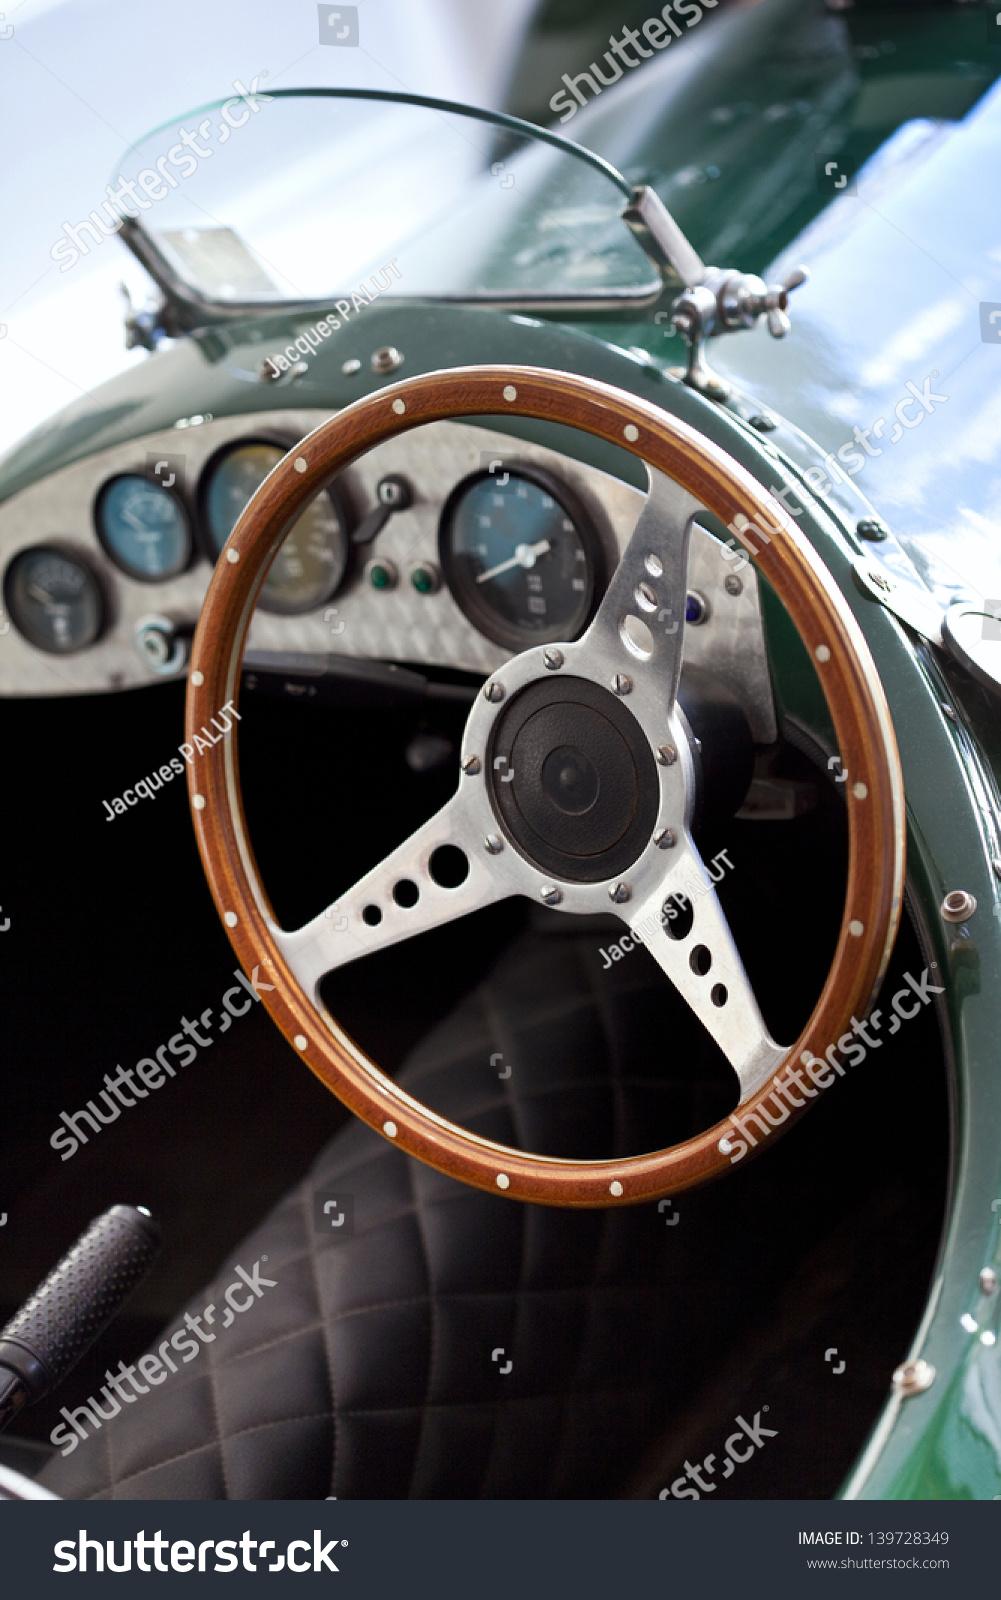 Wheel Vintage Car Stock Photo 139728349 - Shutterstock